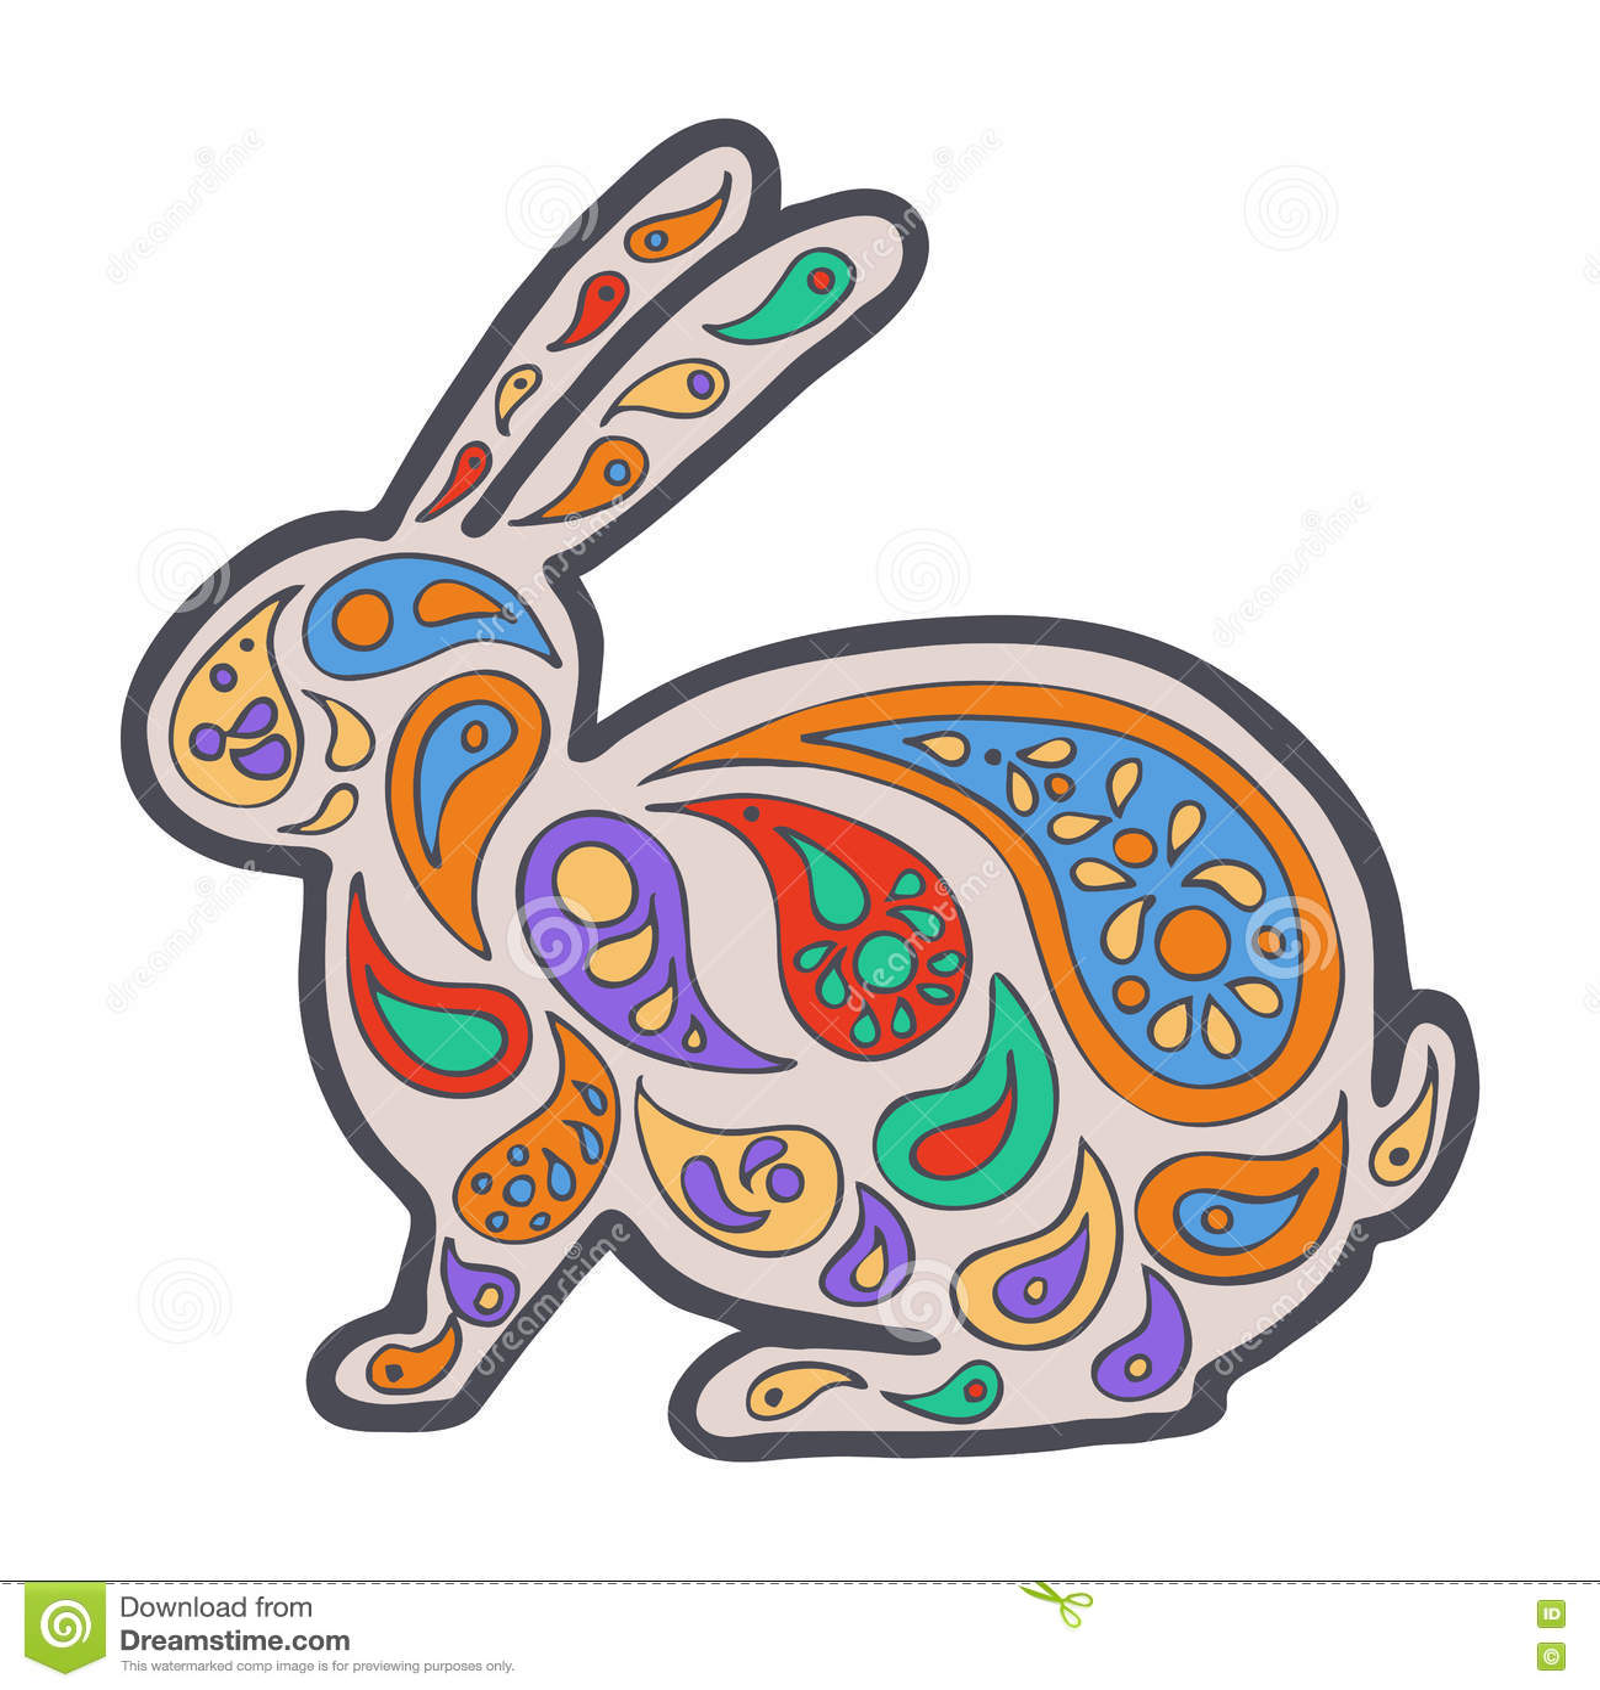 Download Zentangle And Zendoodle Hare Zen Tangle Doodle Animal Coloring Book Wildlife